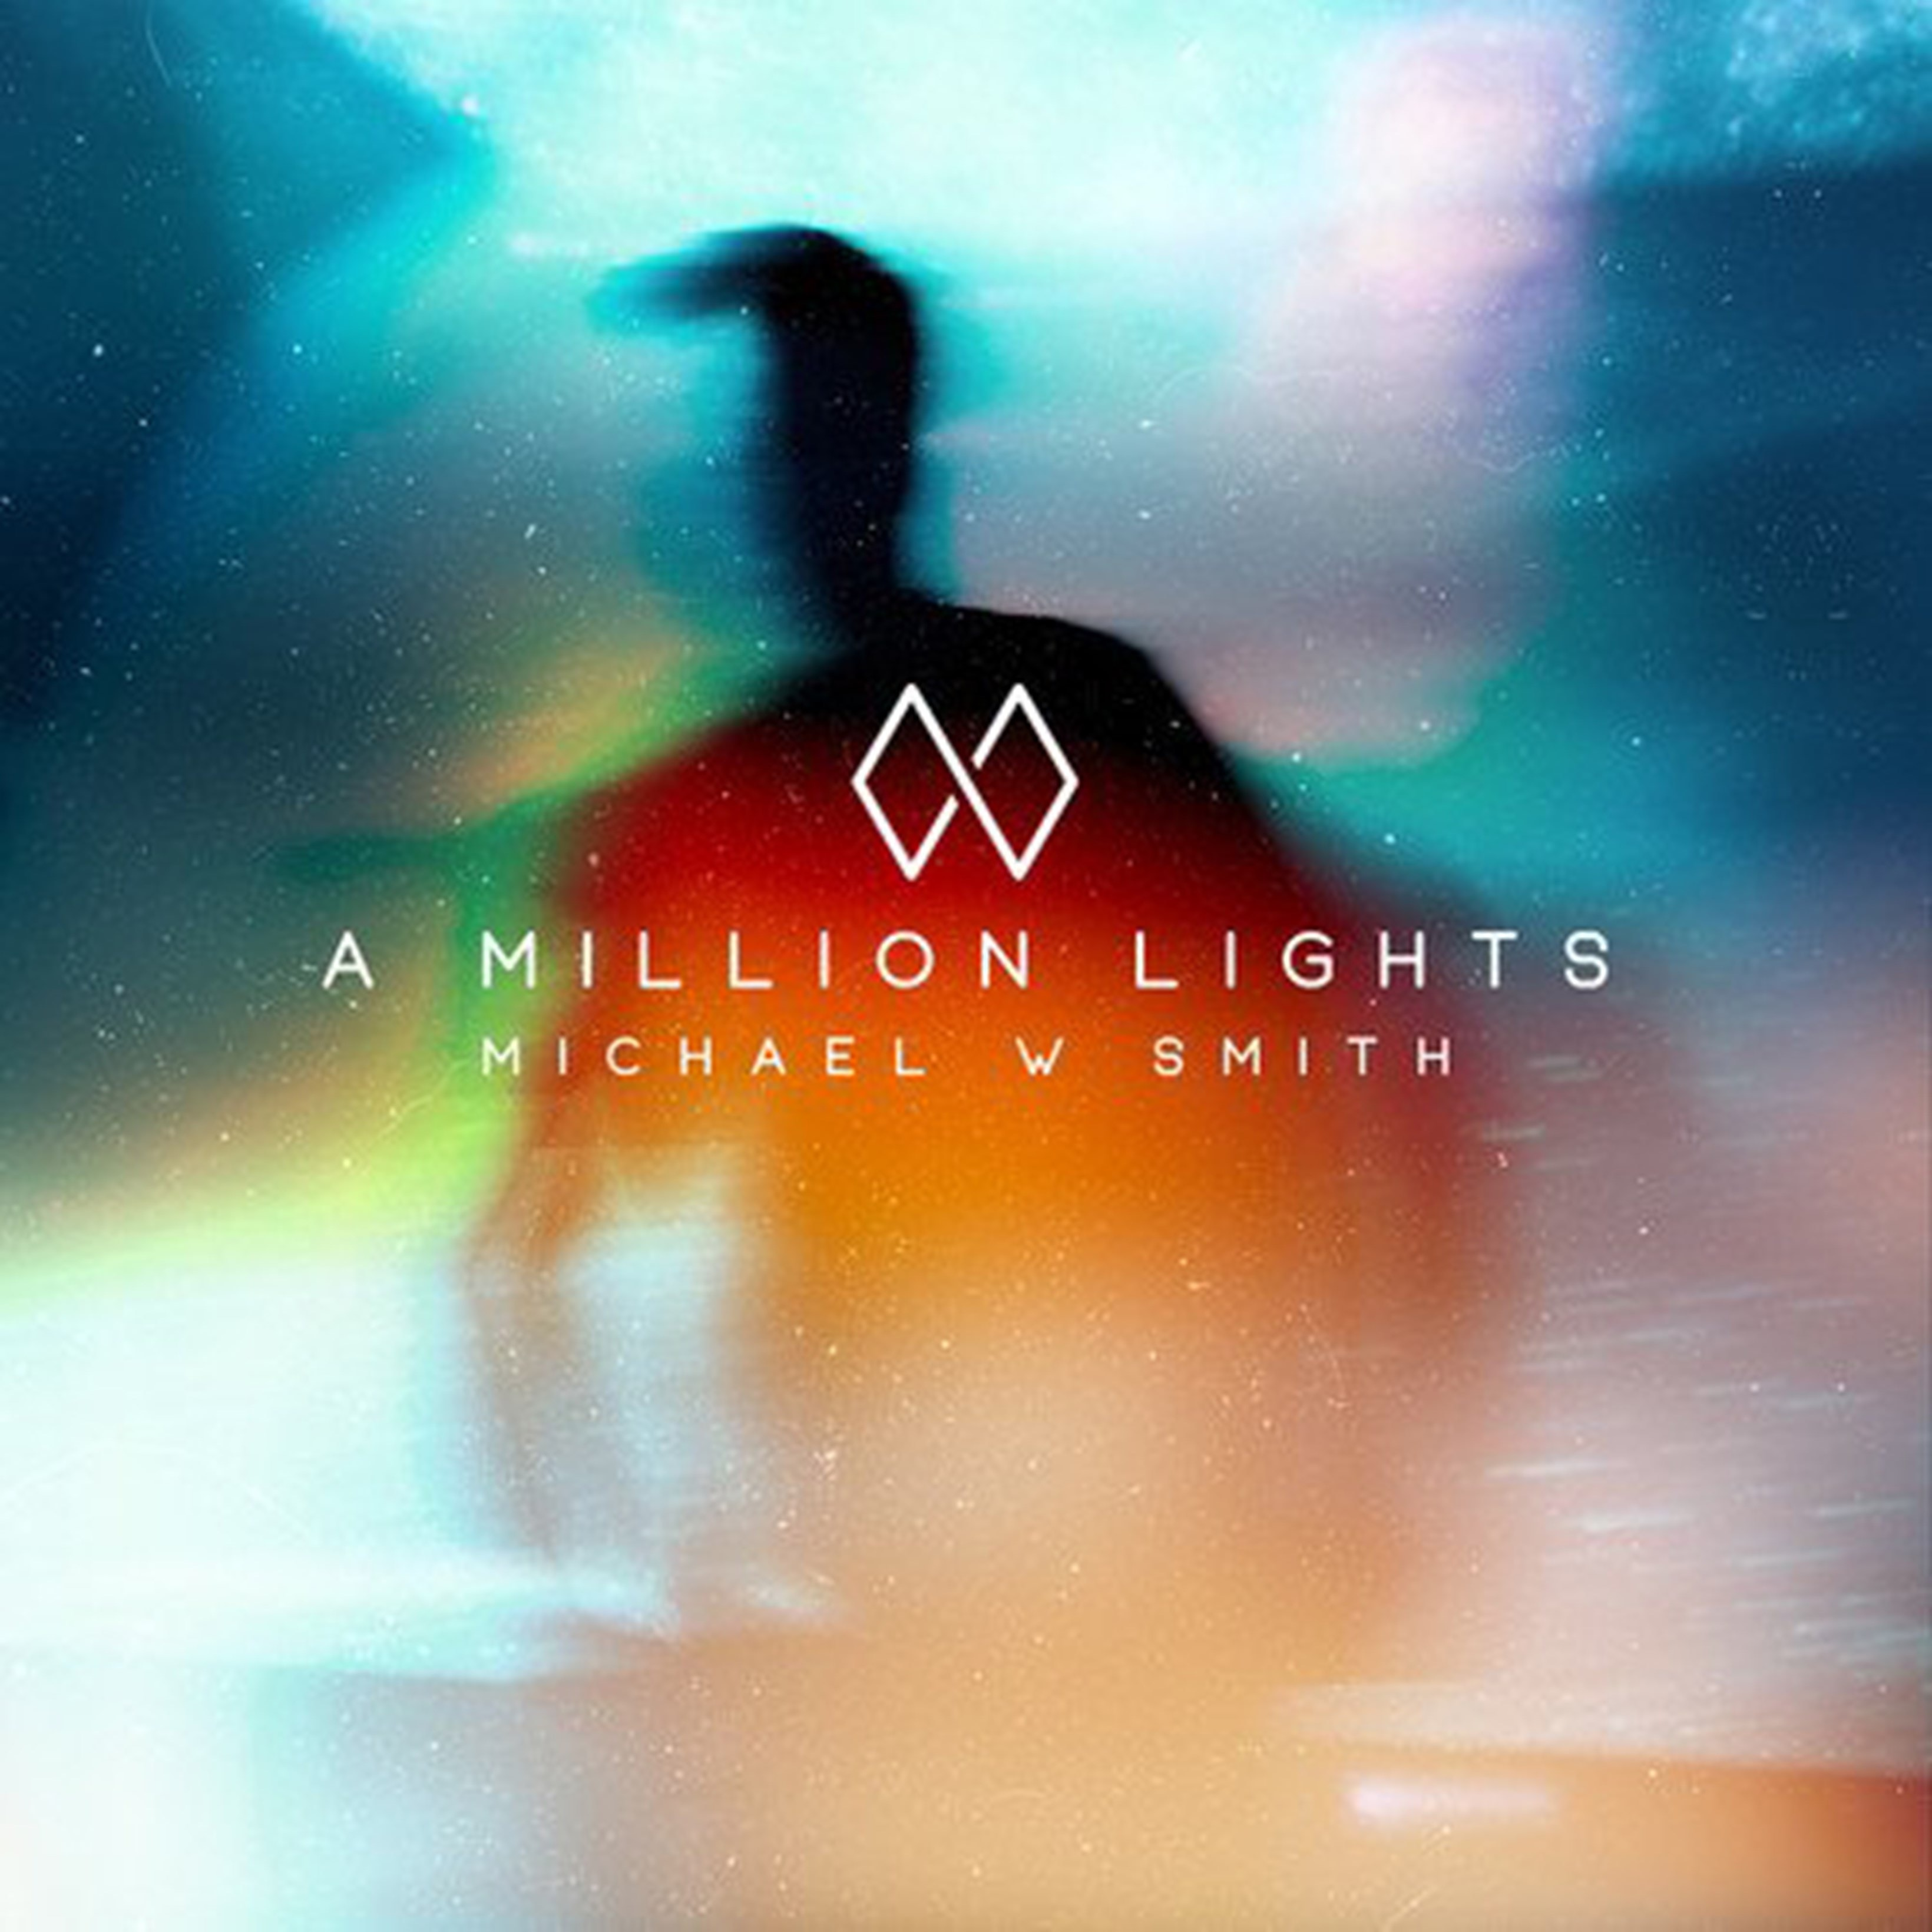 A Million Lights - 1